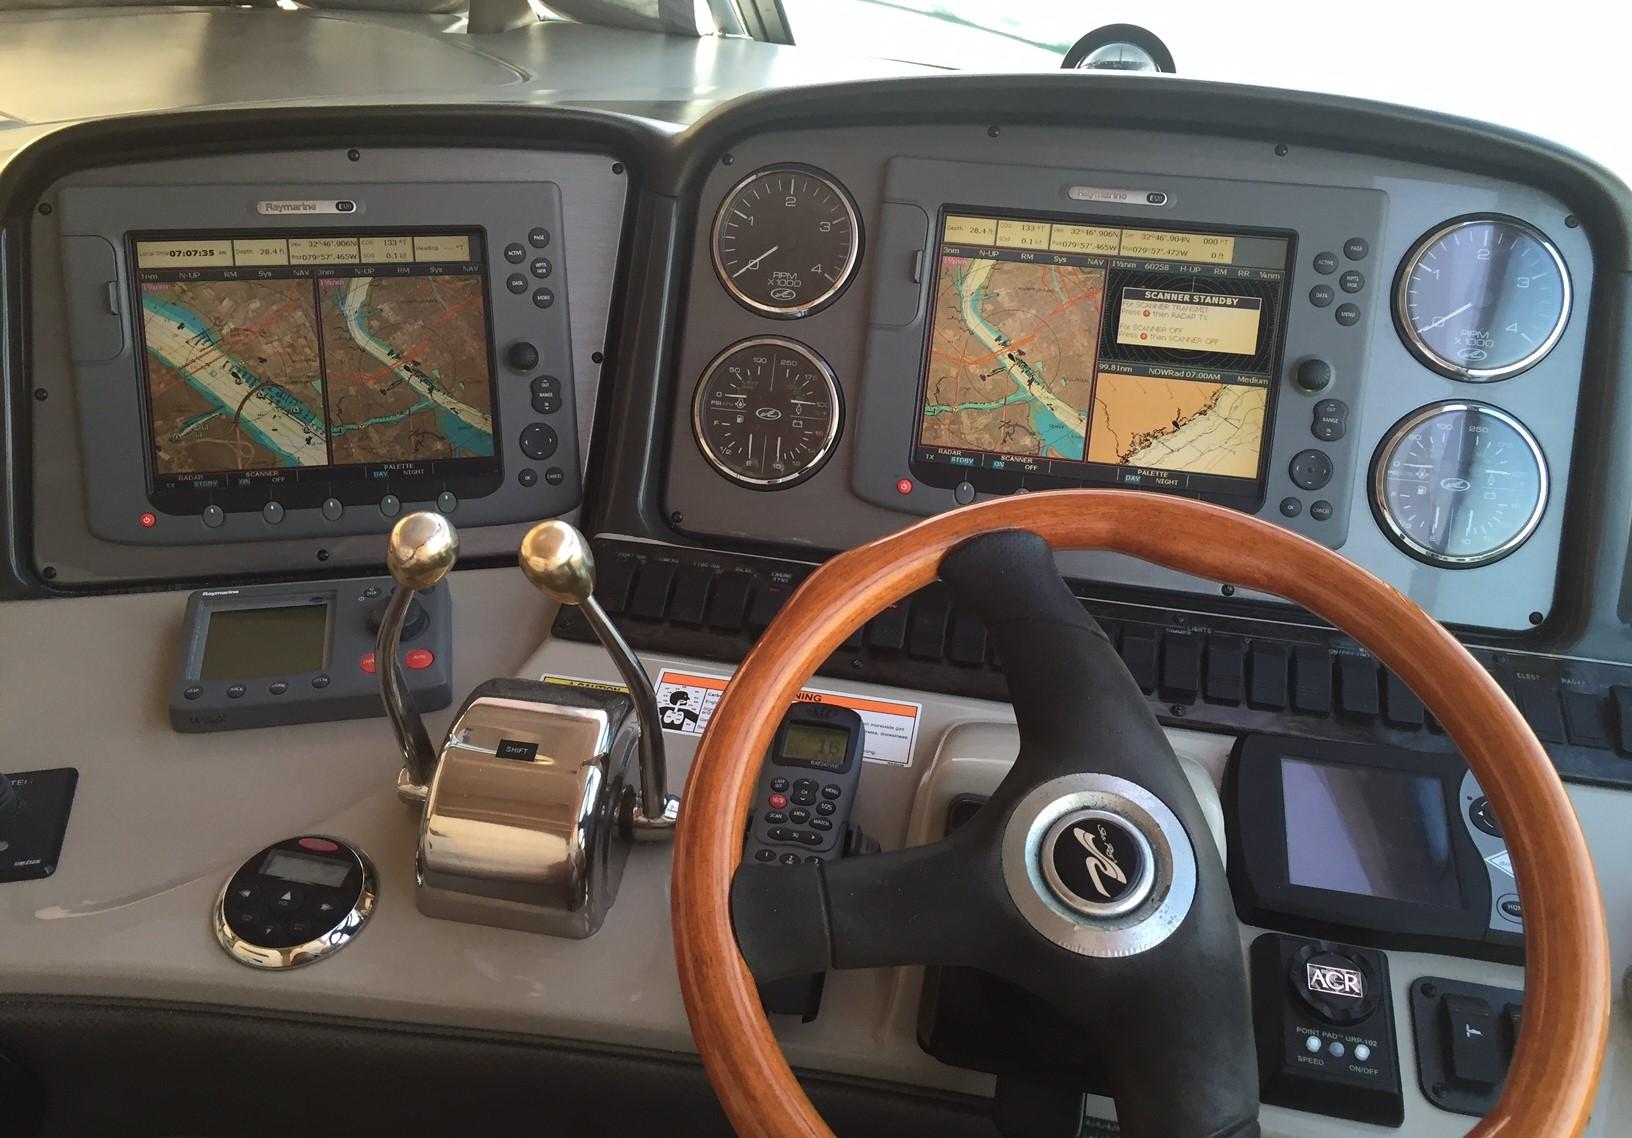 Dual E120 Classic To E125 Helm Upgrade Mercury Smartcraft Wiring Diagram Engine Attached Files Thumbnails